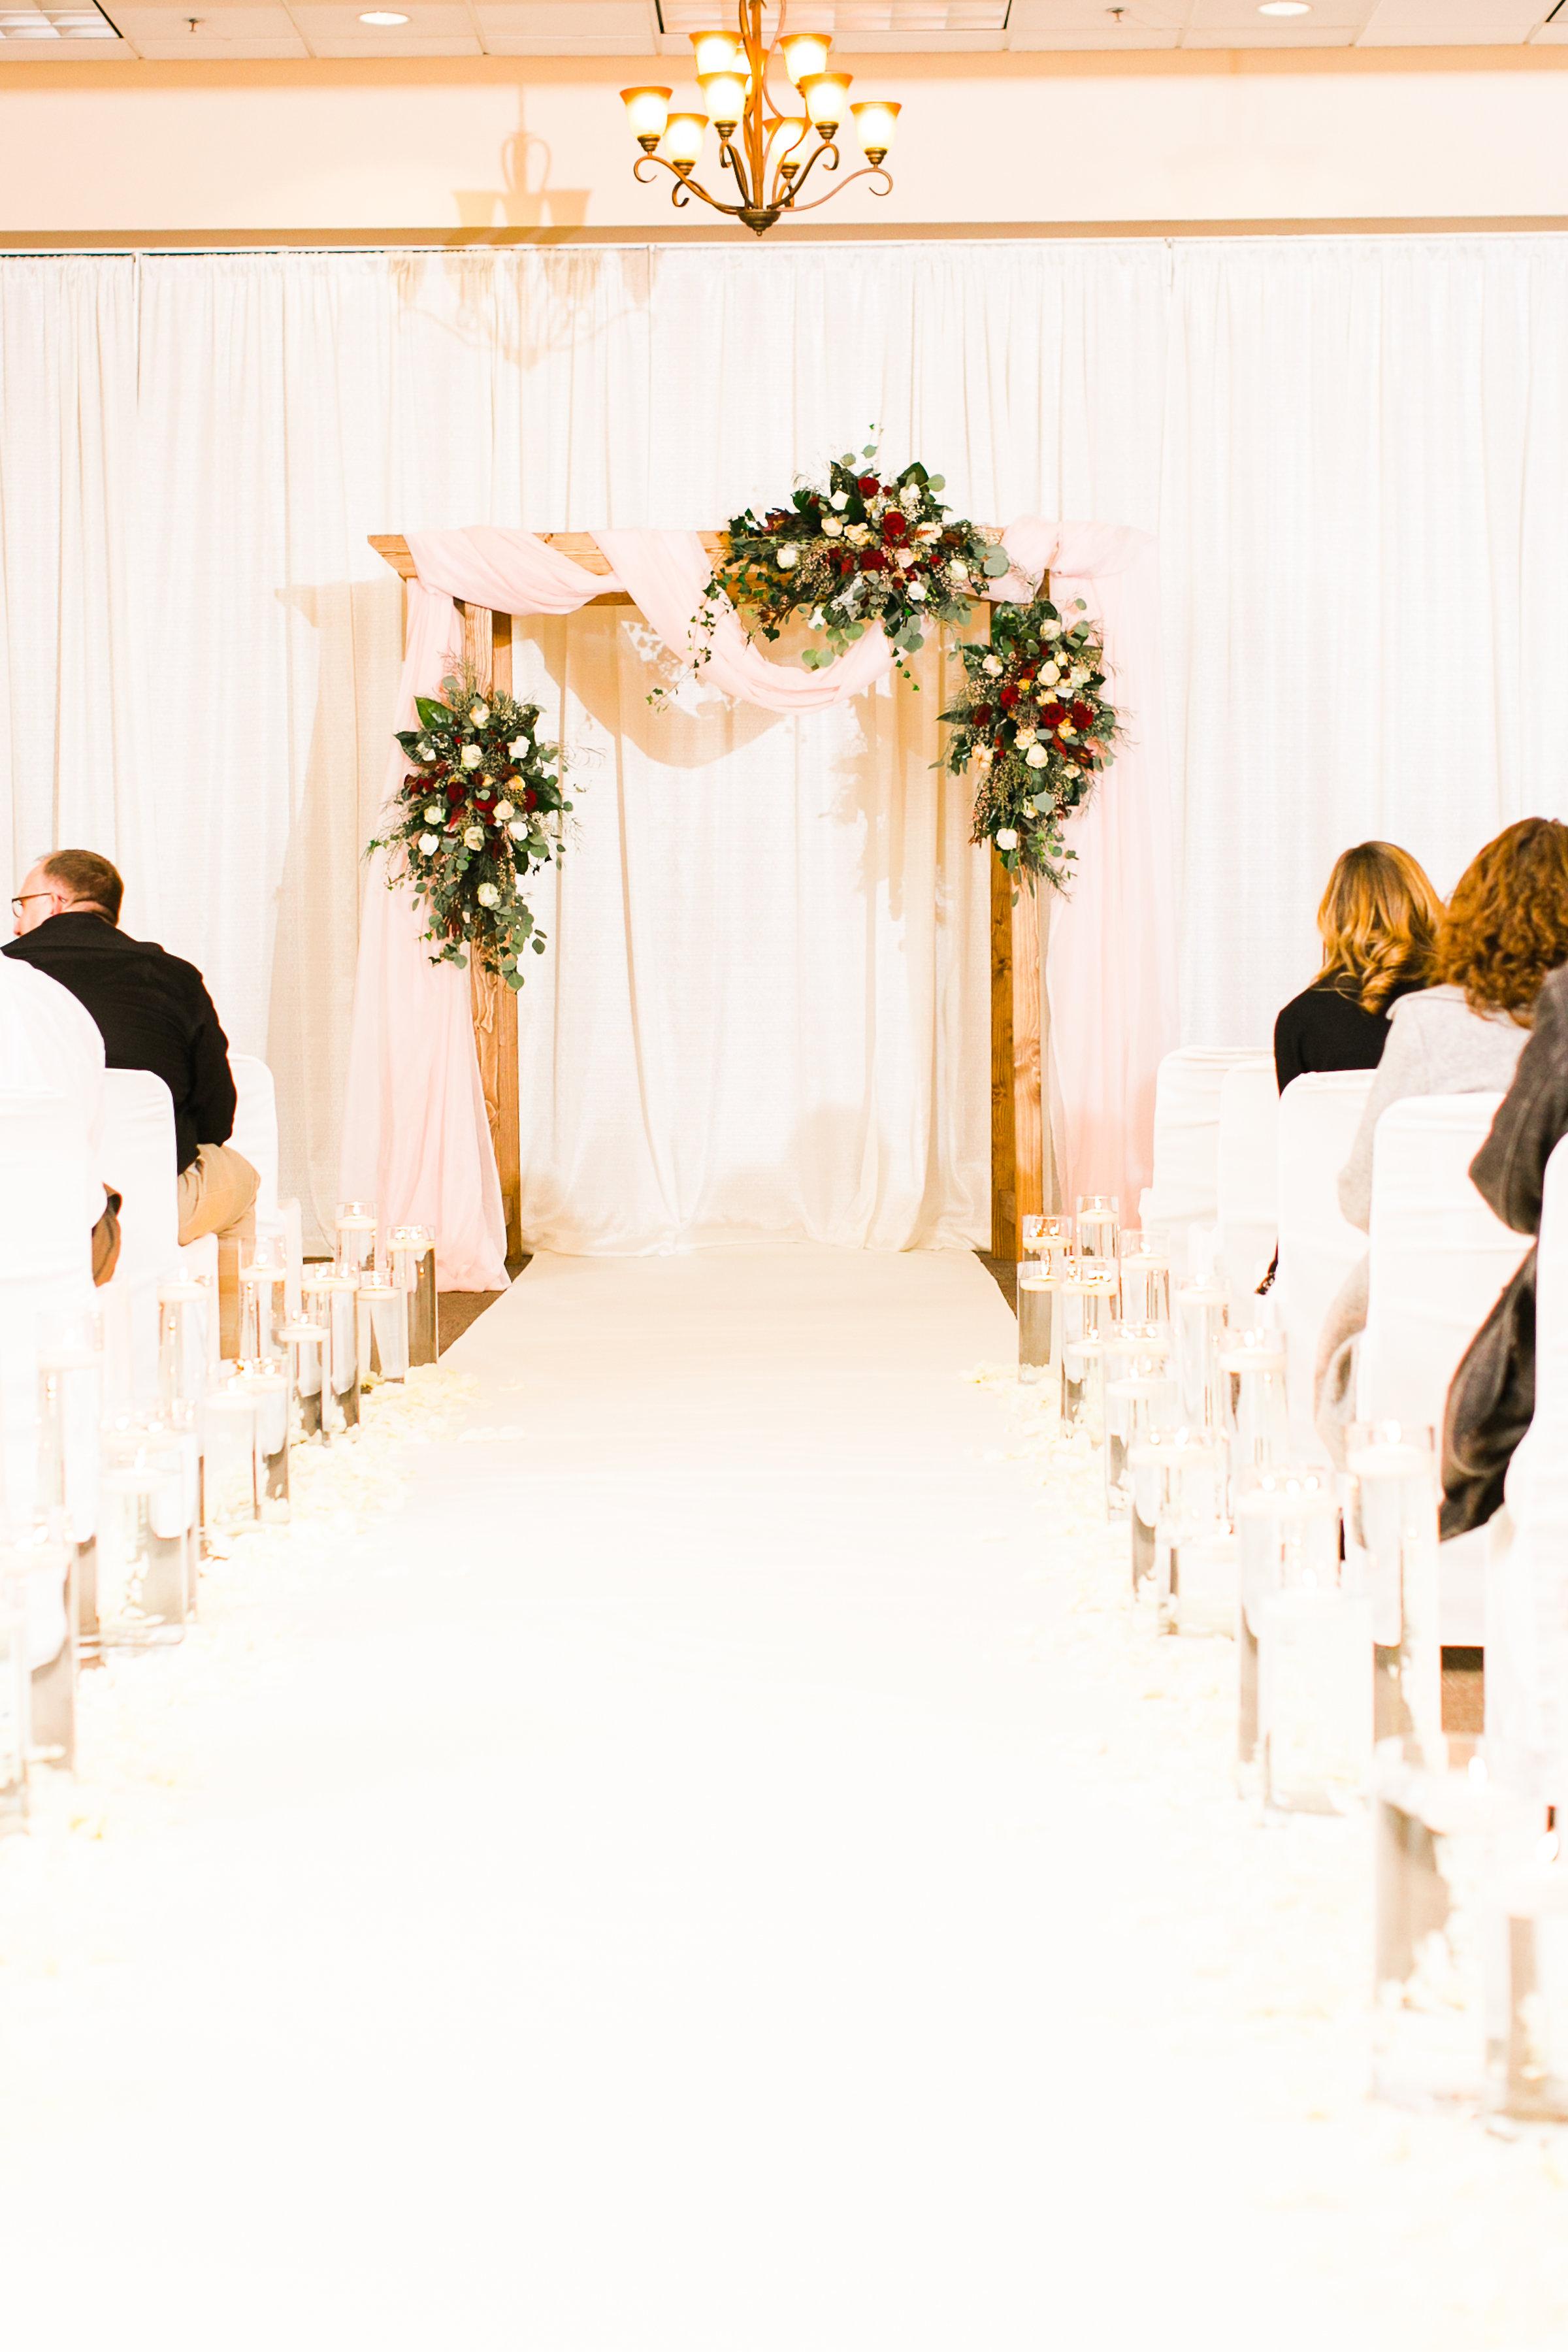 Alanna&Dan~Ceremony-30.jpg